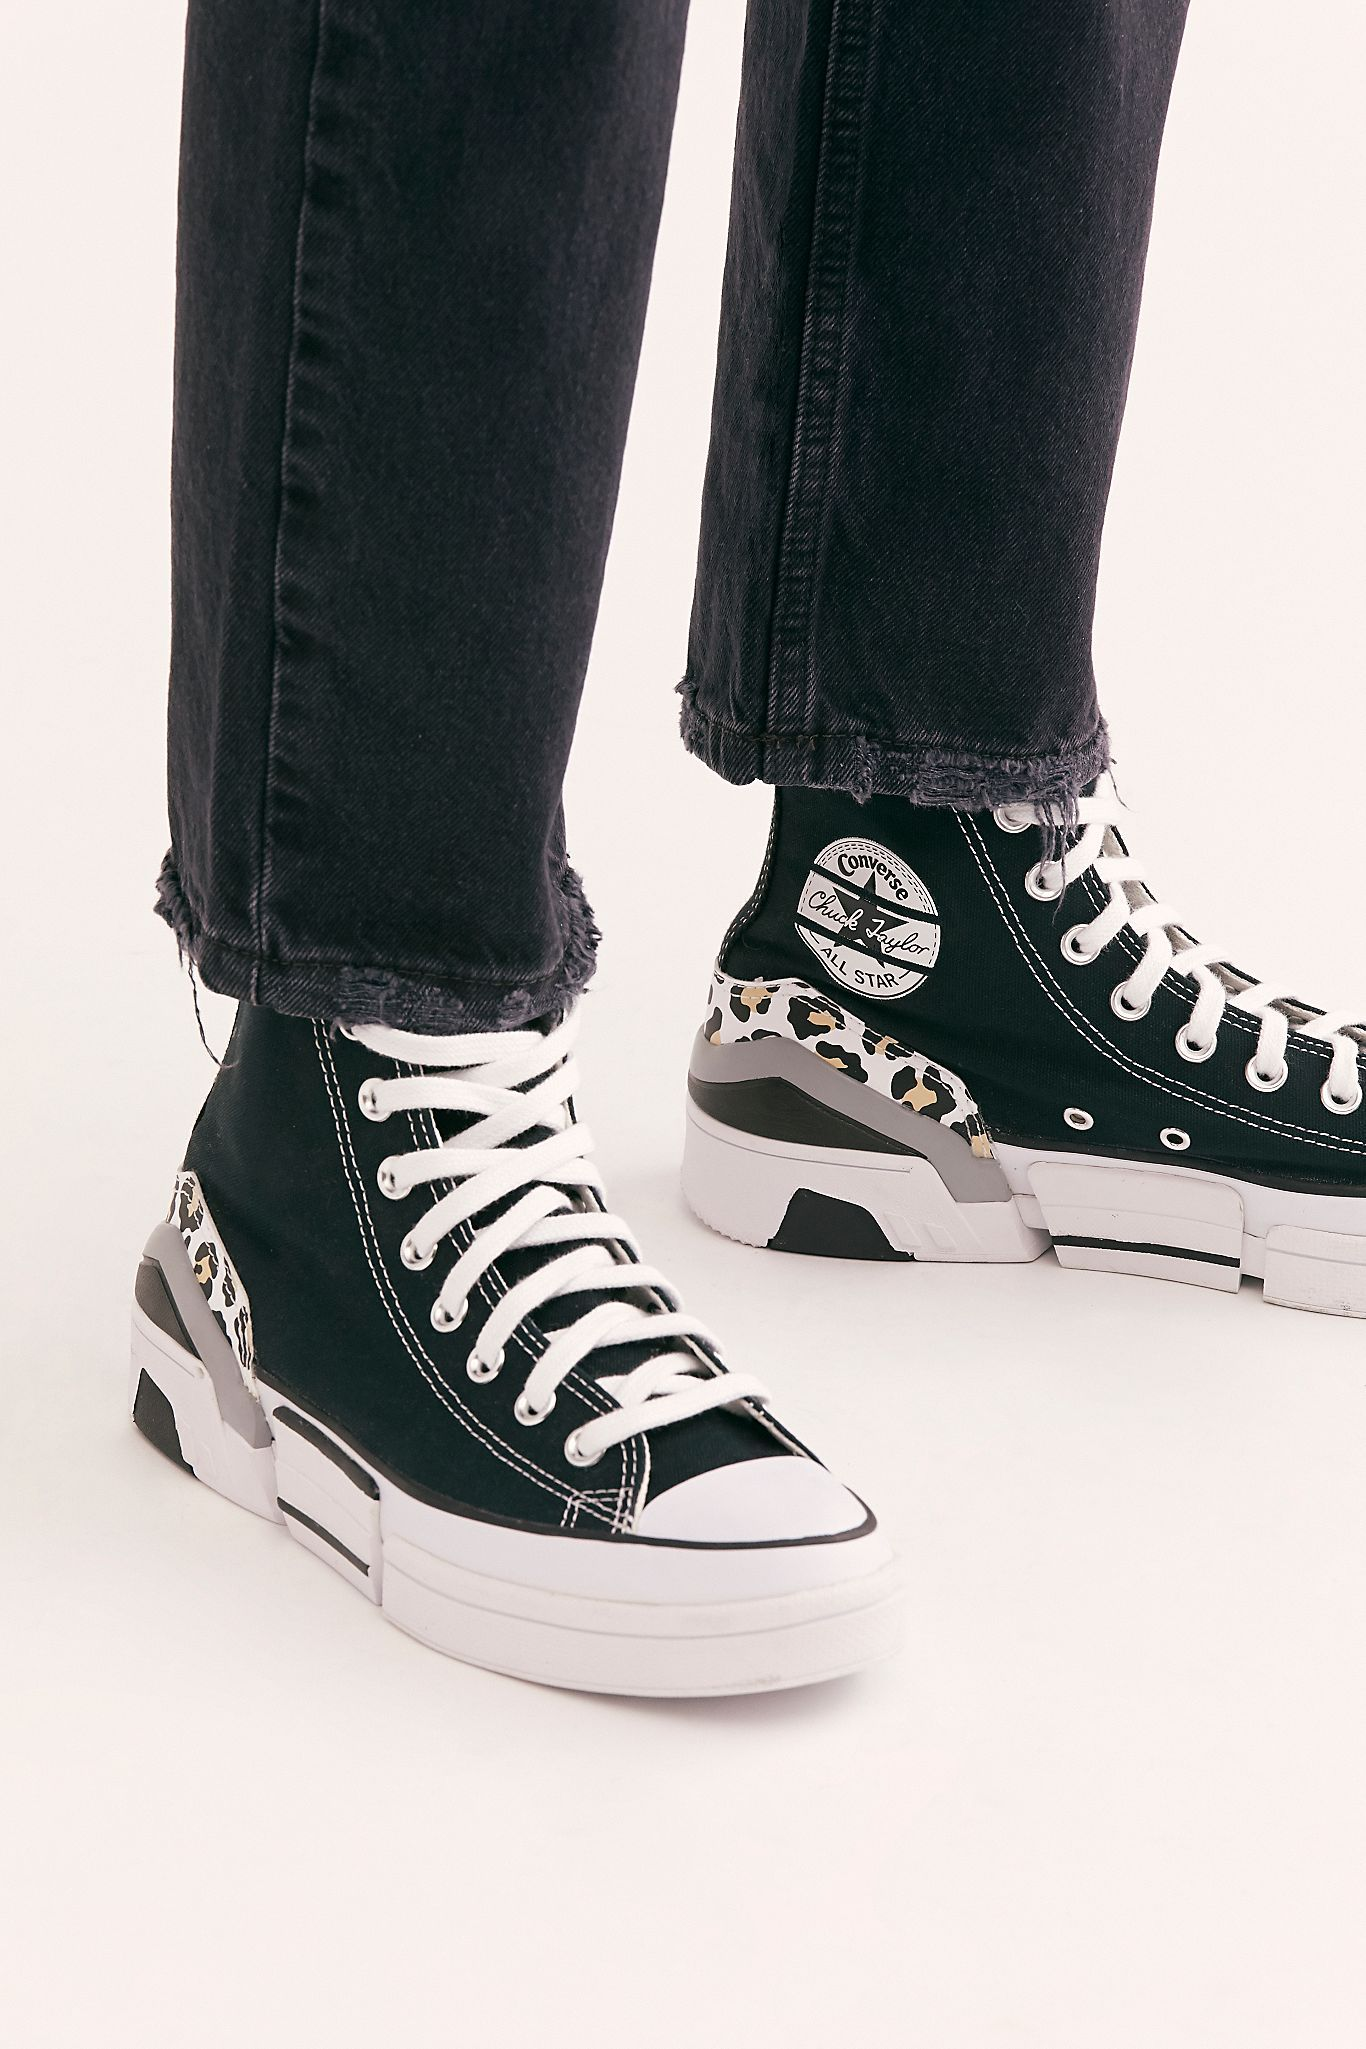 CPX 70 Hi-Top Sneakers in 2020 | Unique